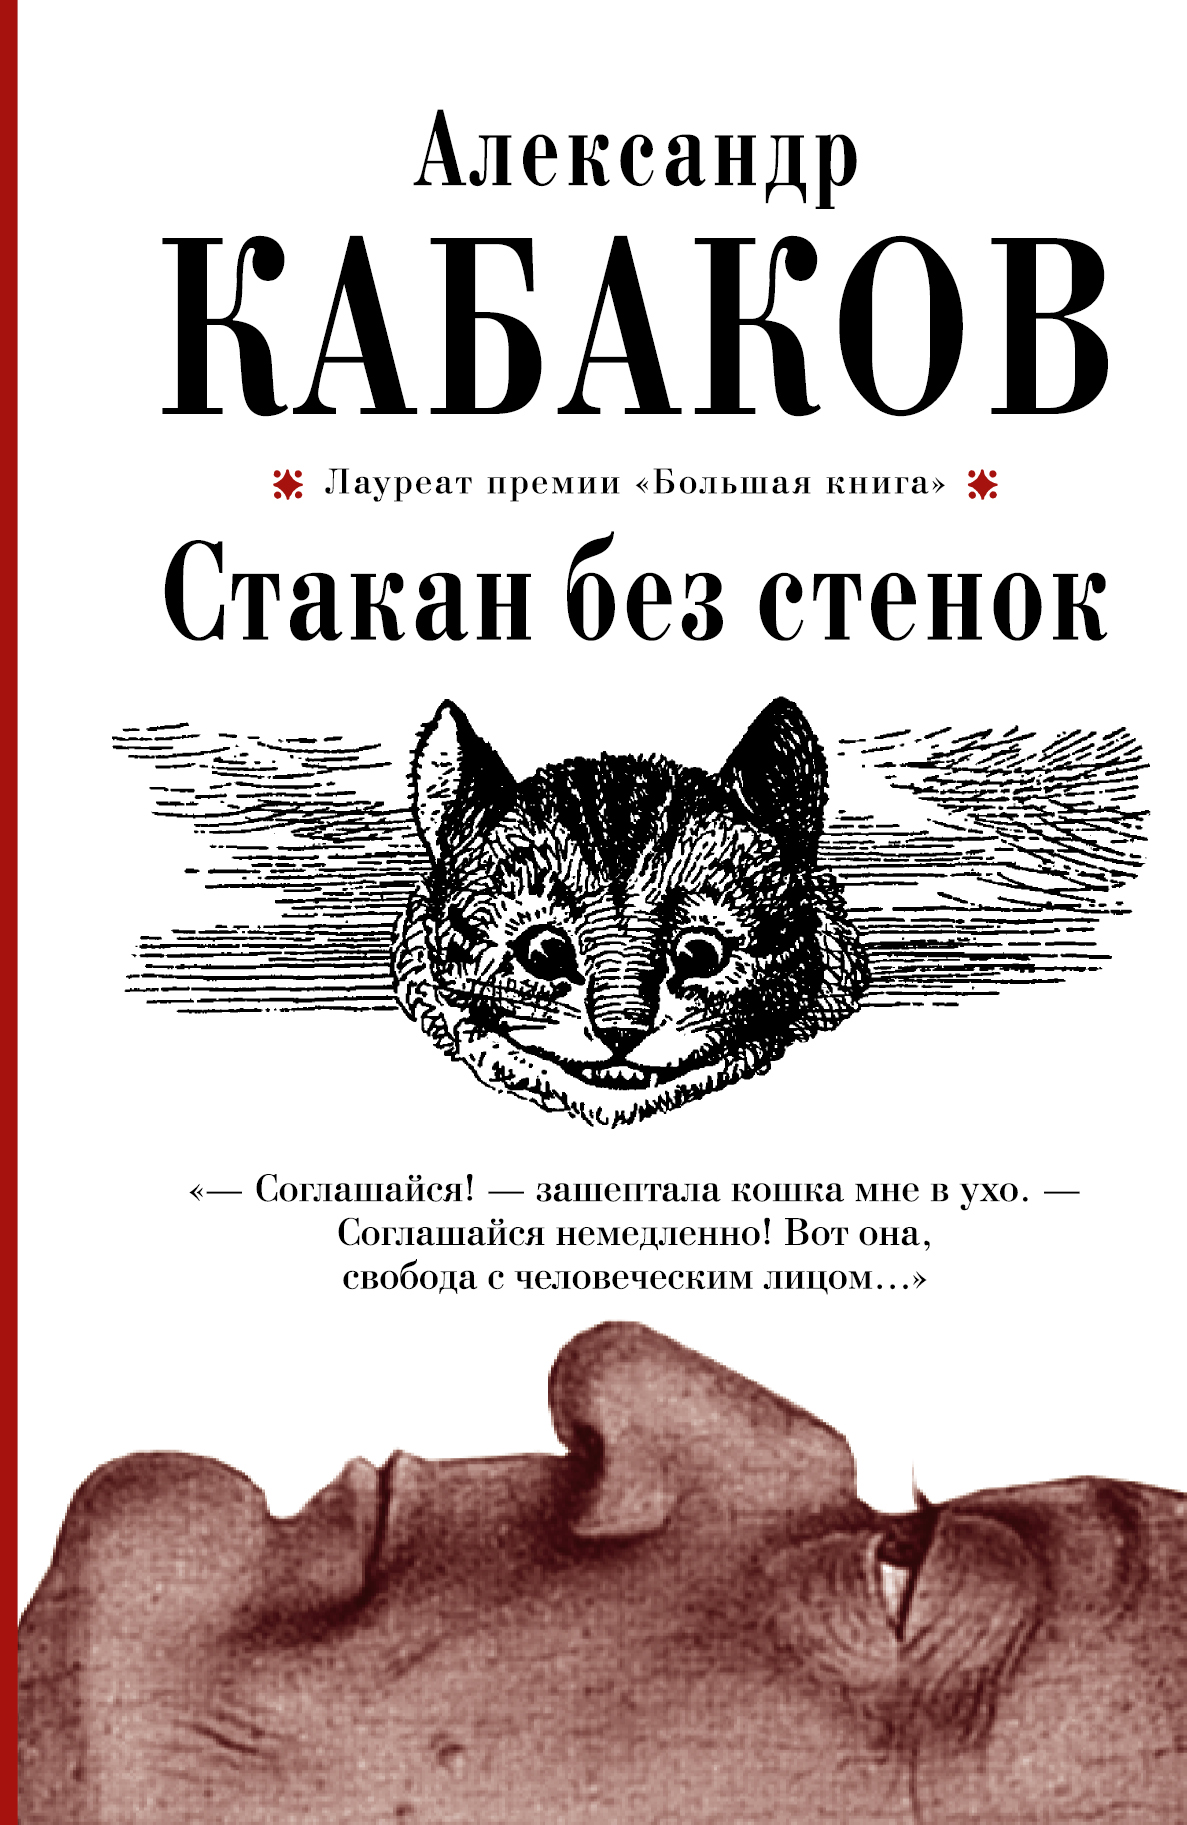 Кабаков А.А. Стакан без стенок ISBN: 978-5-17-087099-8 александр кабаков русские не придут сборник